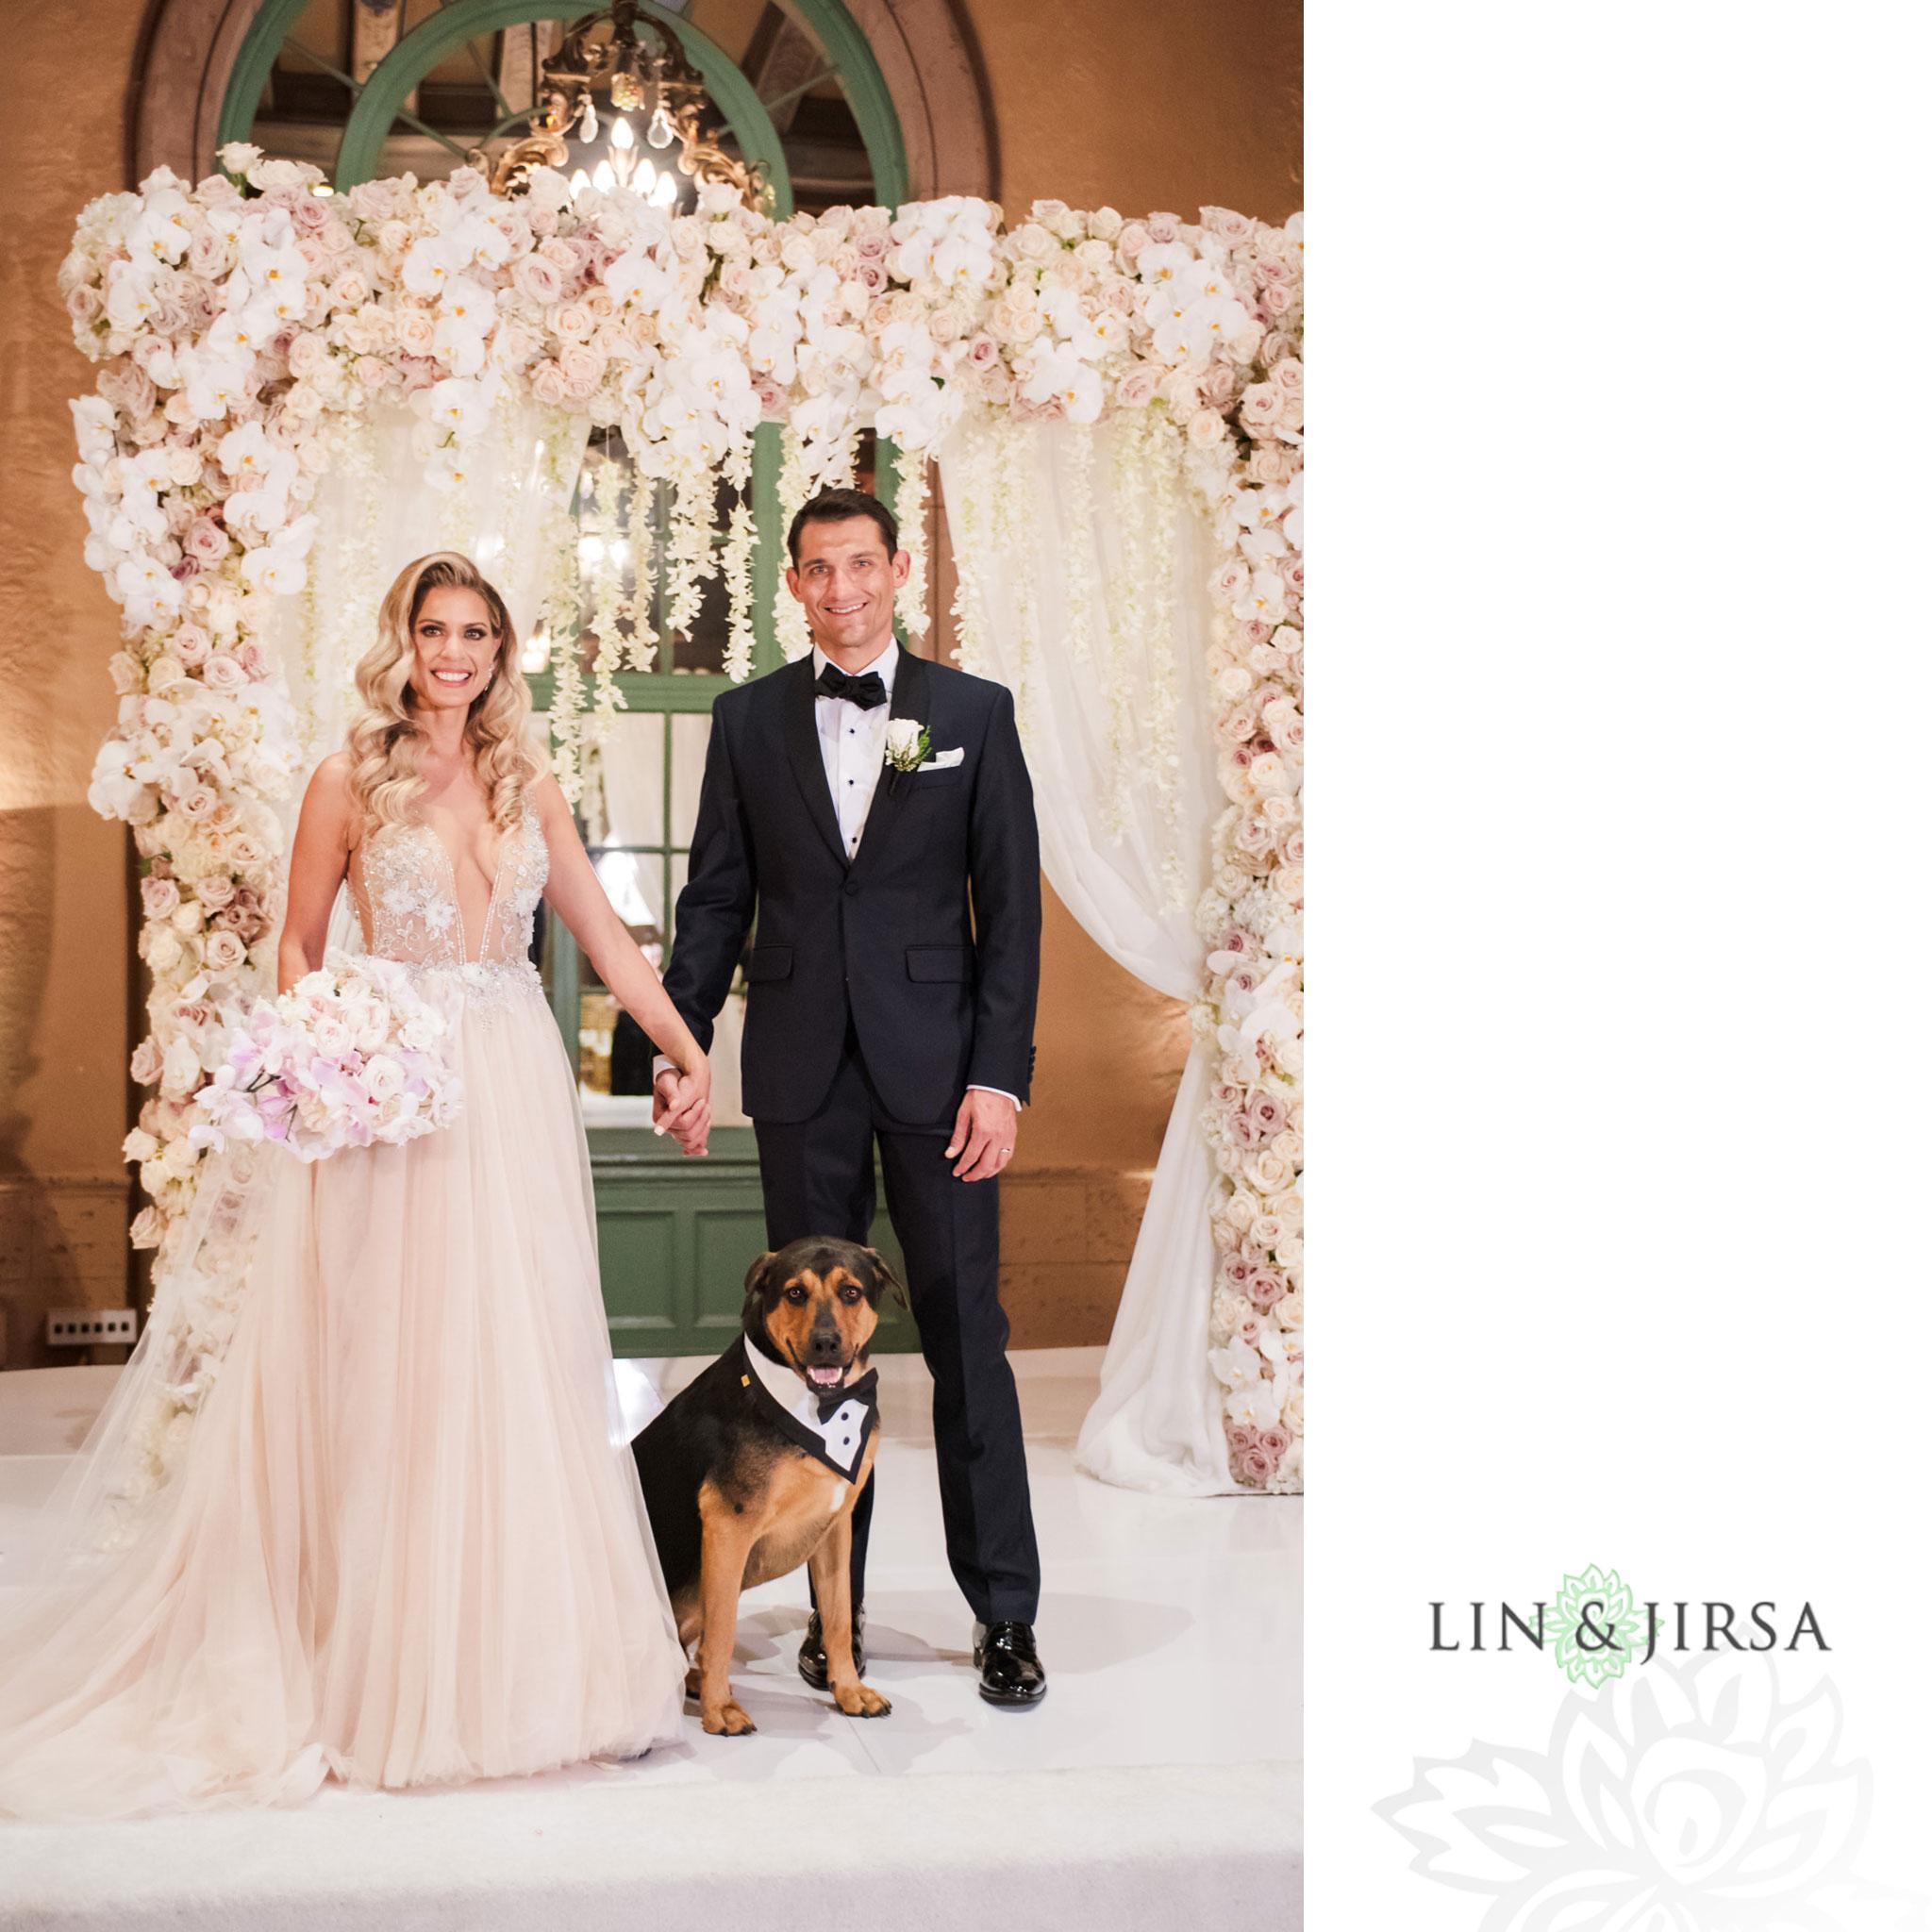 015 millennium biltmore hotel los angeles wedding photography